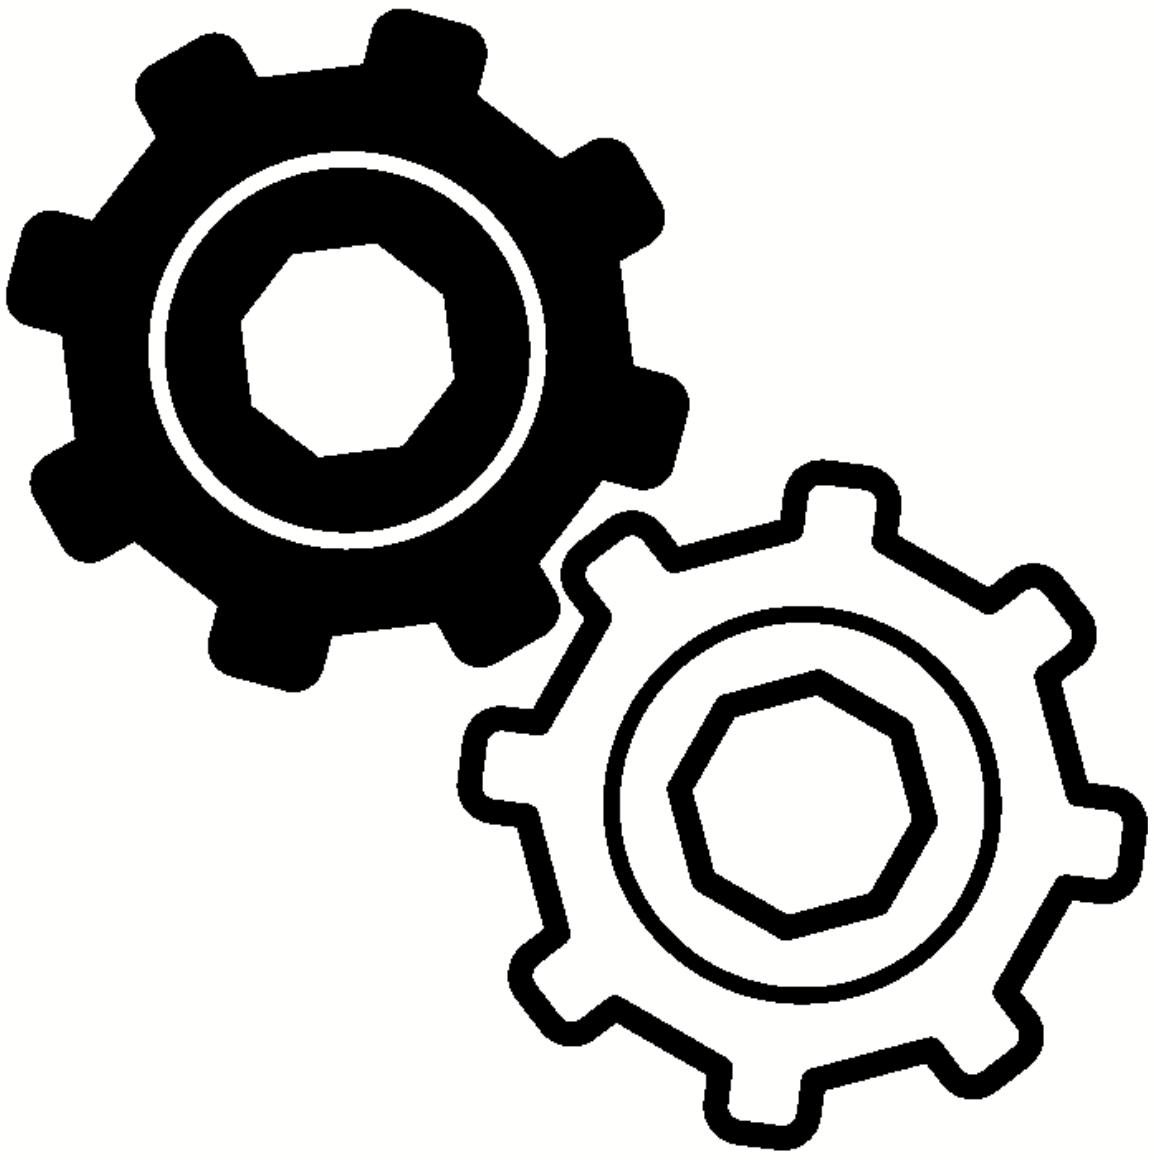 Mechanical Engineer (3)